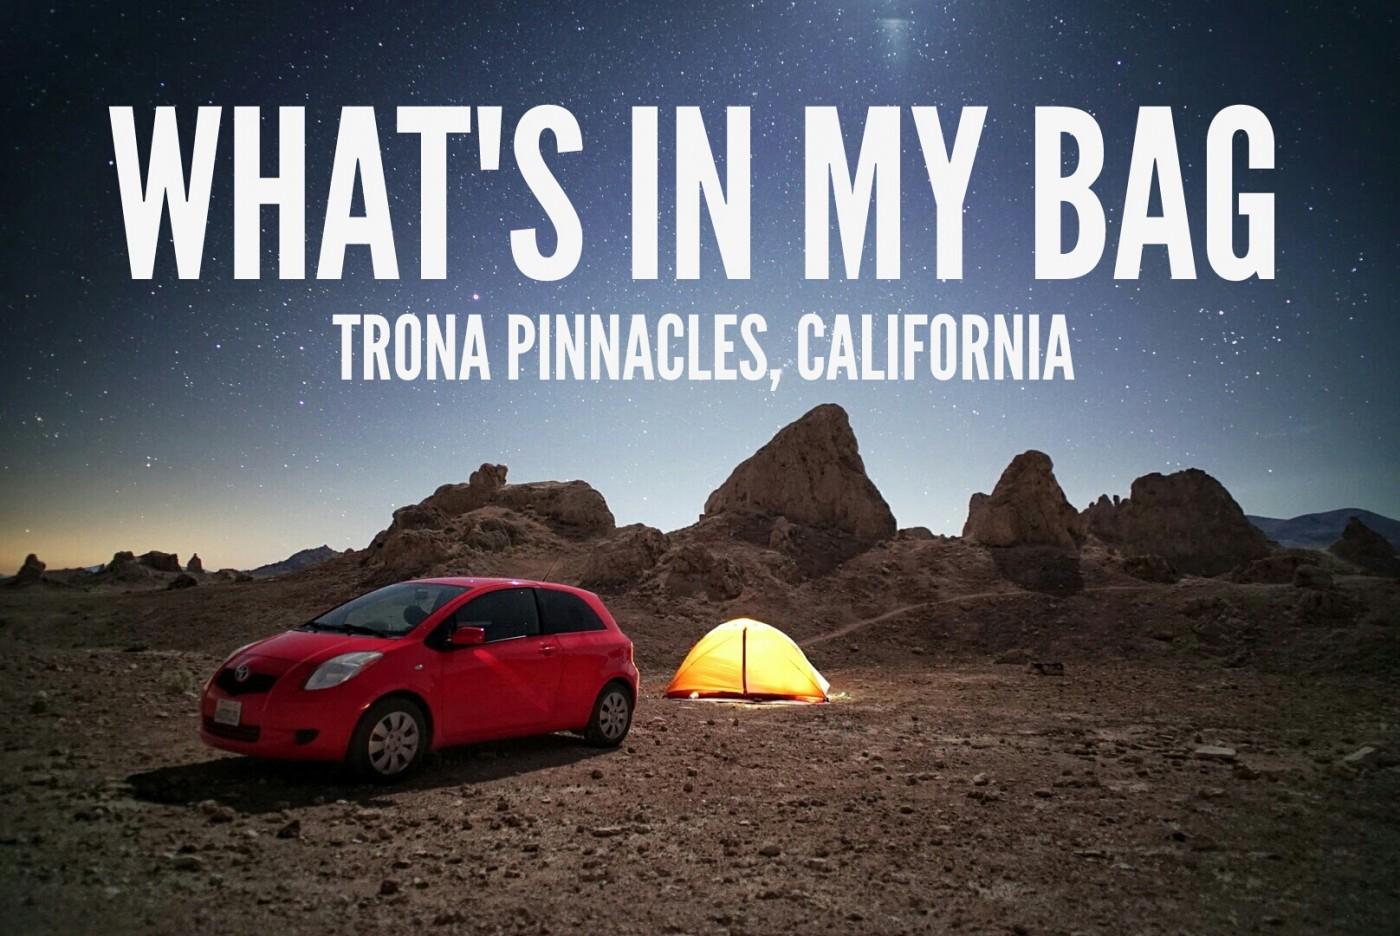 What's In My Bag - Trona Pinnacles, California